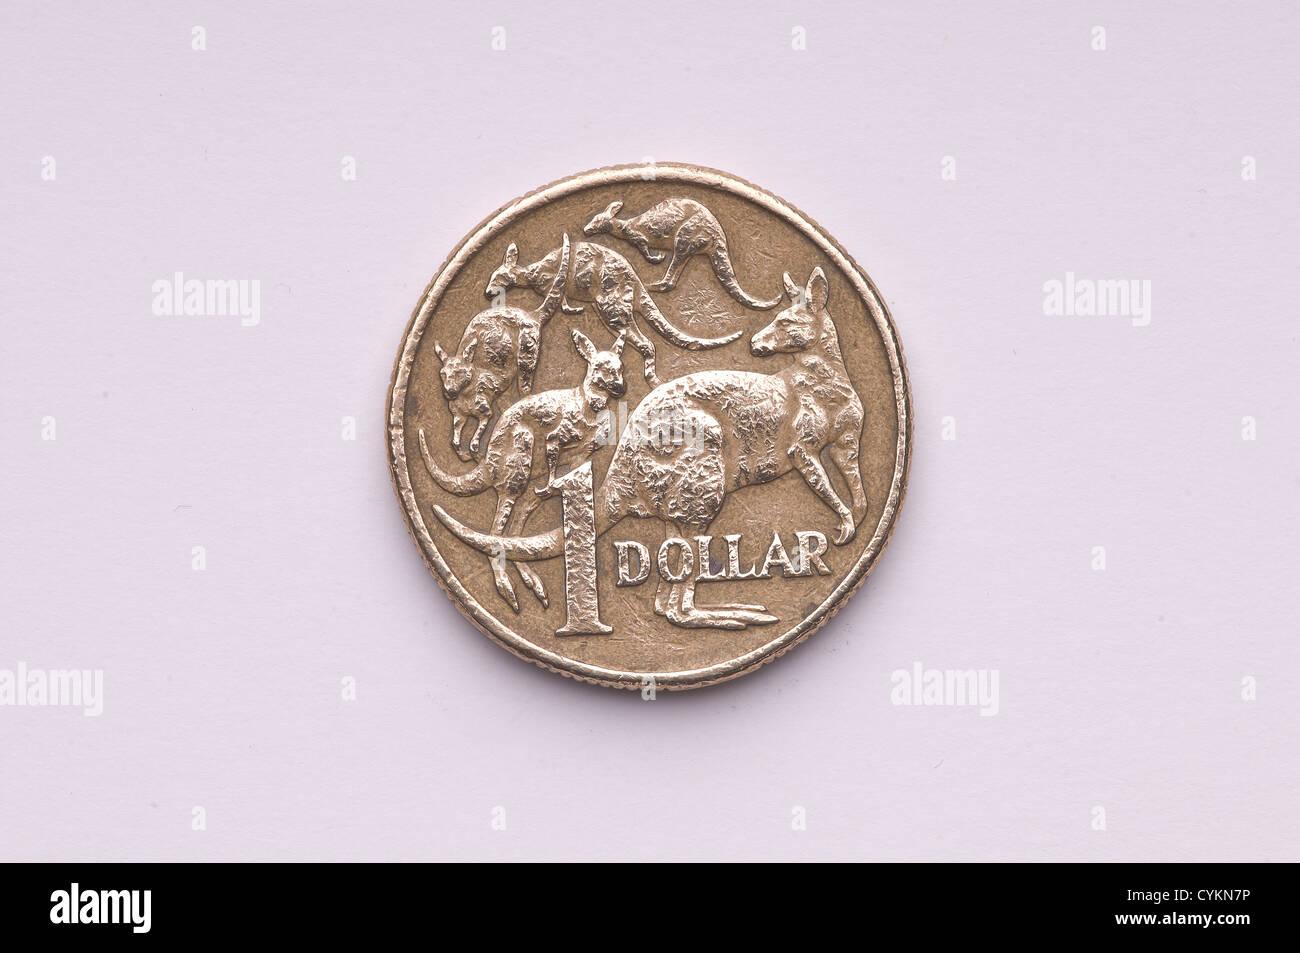 An australian  coin - Stock Image